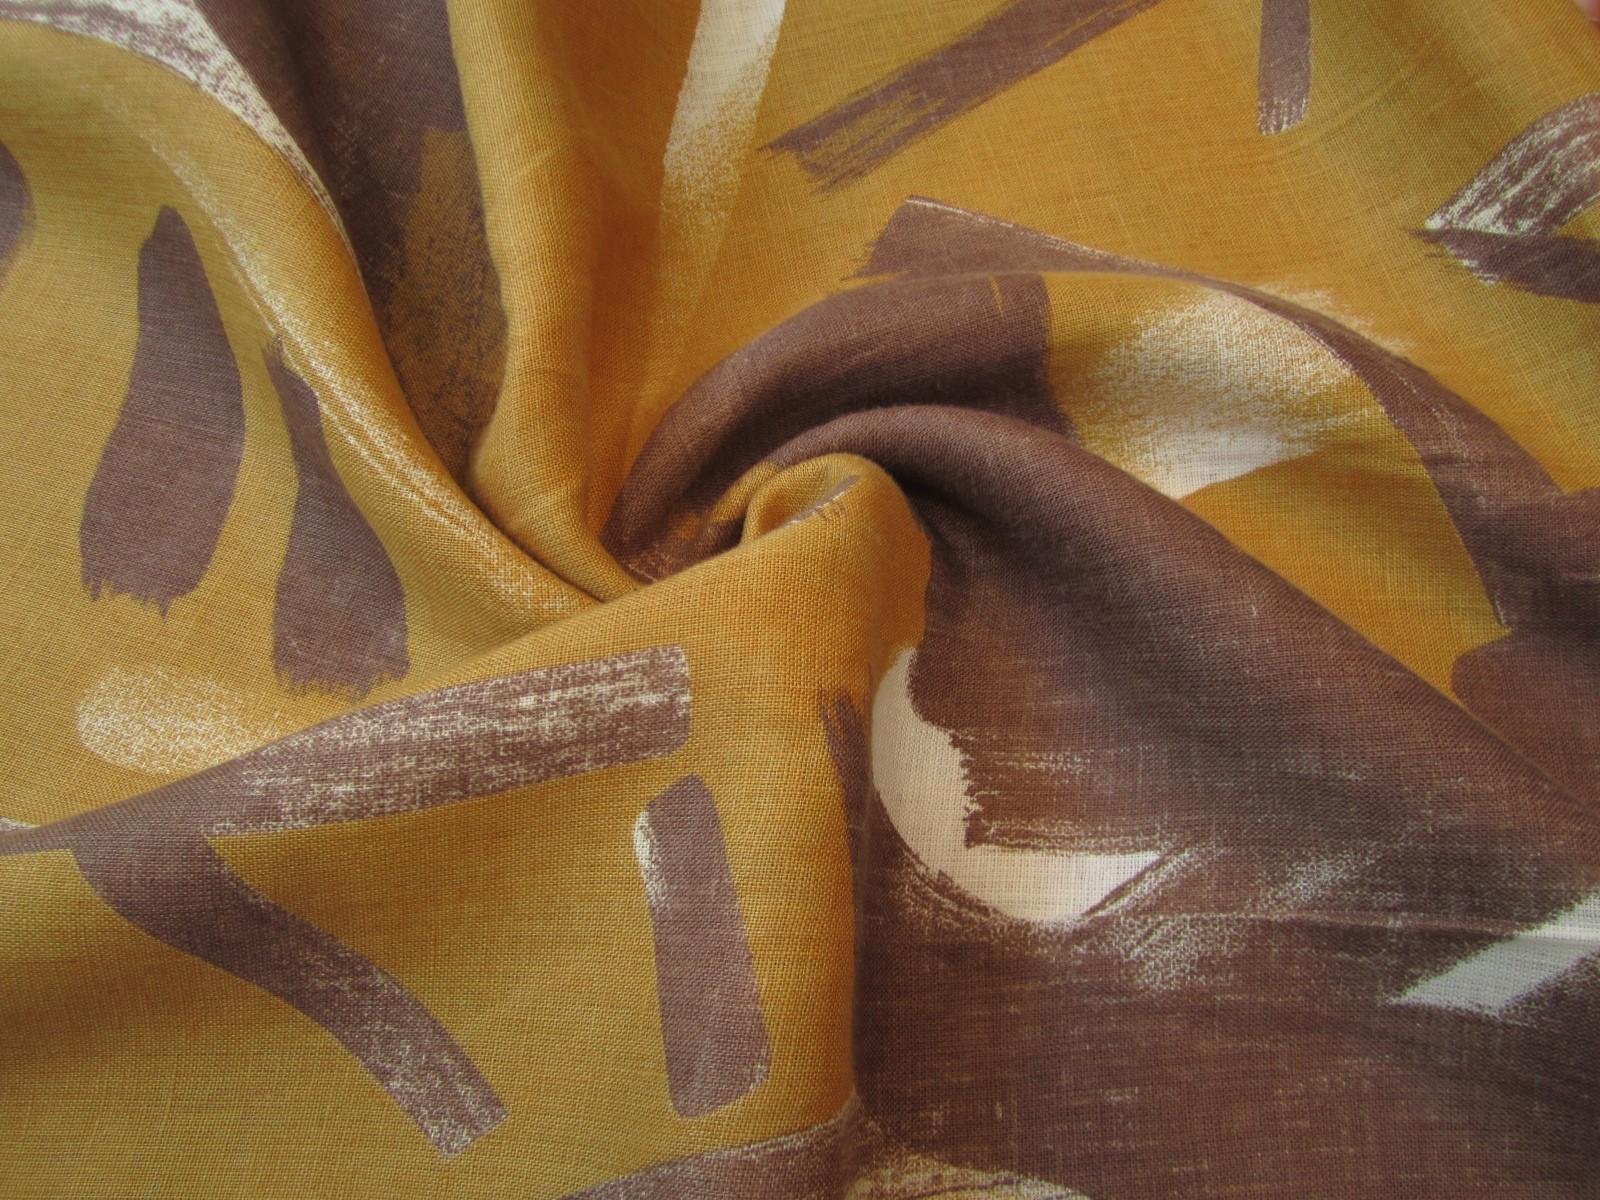 Len malowany czekolada kurkuma miód